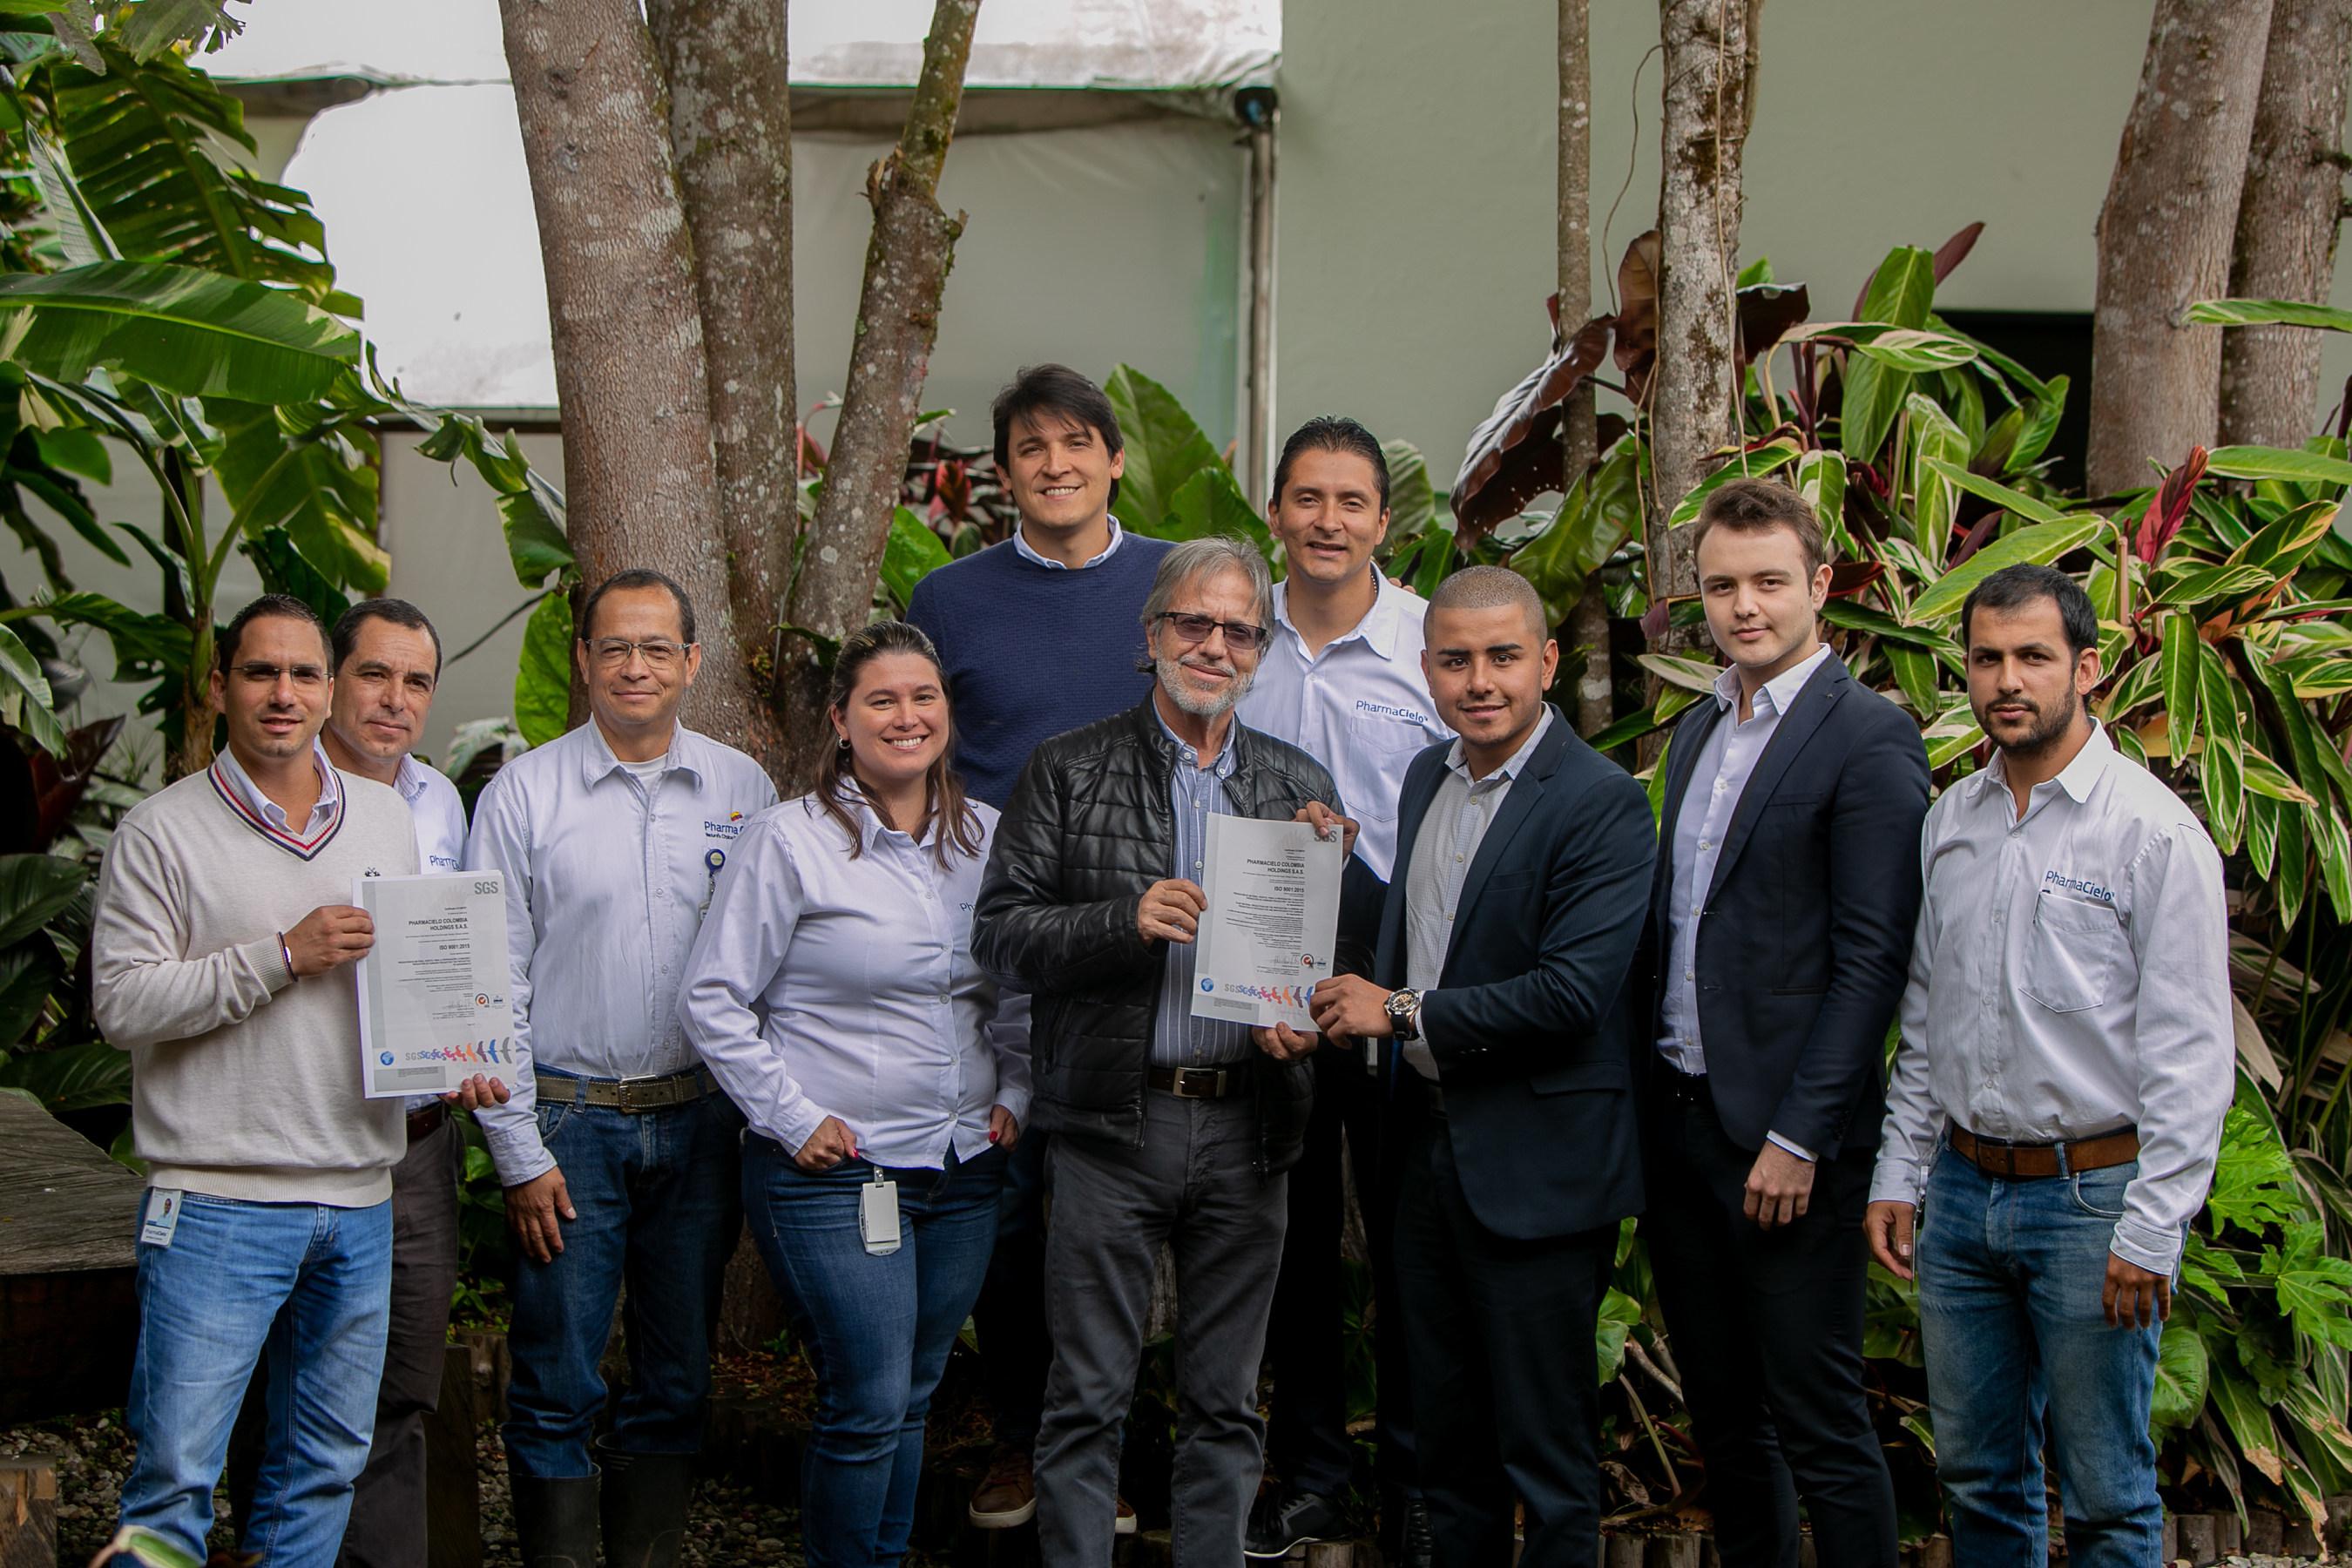 Federico Cock-Correa, president of PharmaCielo Colombia Holdings SAS, (centre-left) and PharmaCielo team receive ISO 9001:2015 certification. (CNW Group/PharmaCielo)